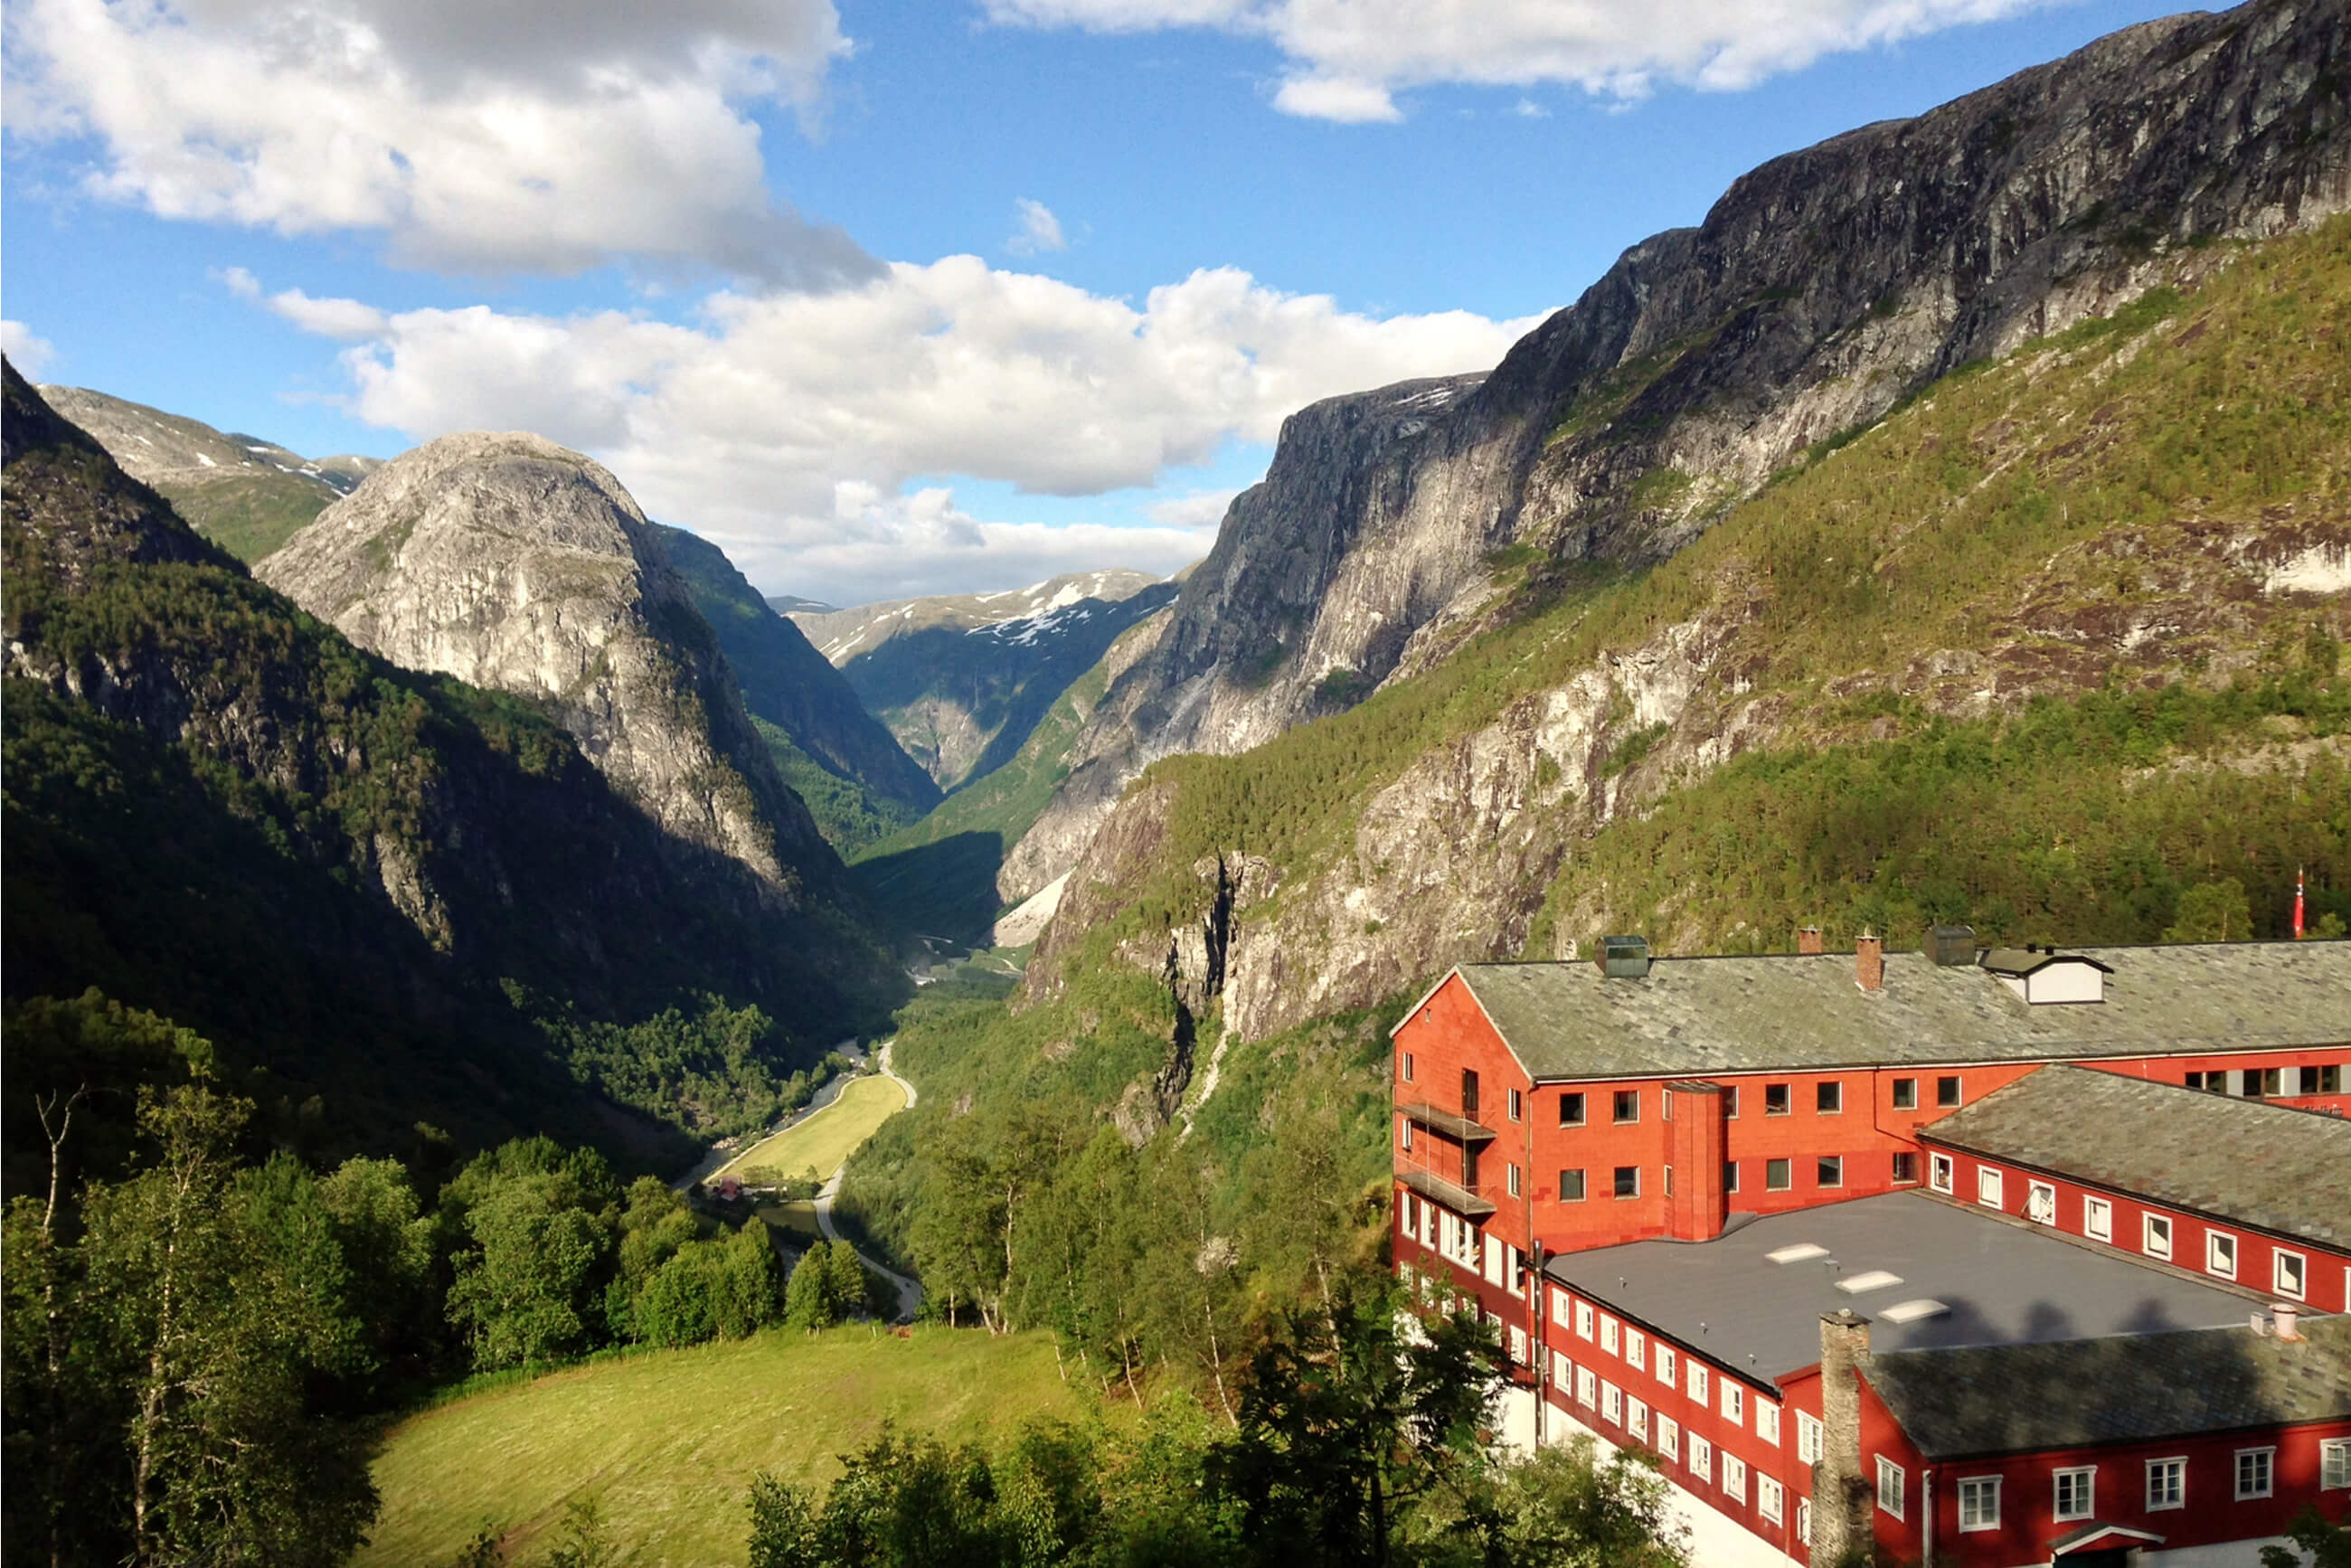 https://bubo.sk/uploads/galleries/5039/3947_norsko-island-noc-v-najkrajsej-doline-v-horskom-hoteli-stalheim-jozef-zeliznak-.jpg